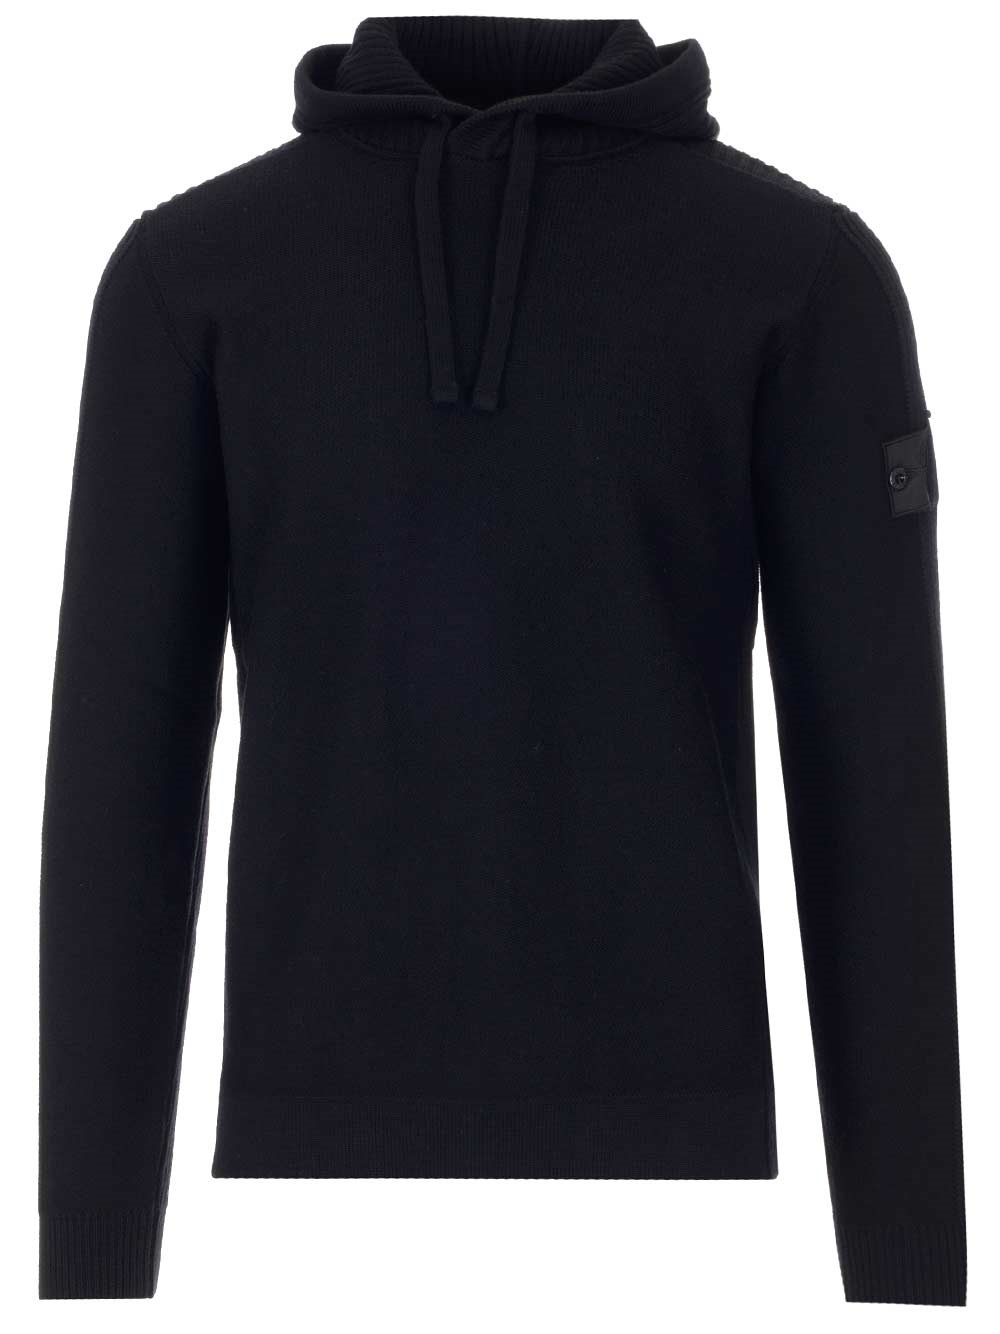 STONE ISLAND SHADOW Black Sweater With Hood